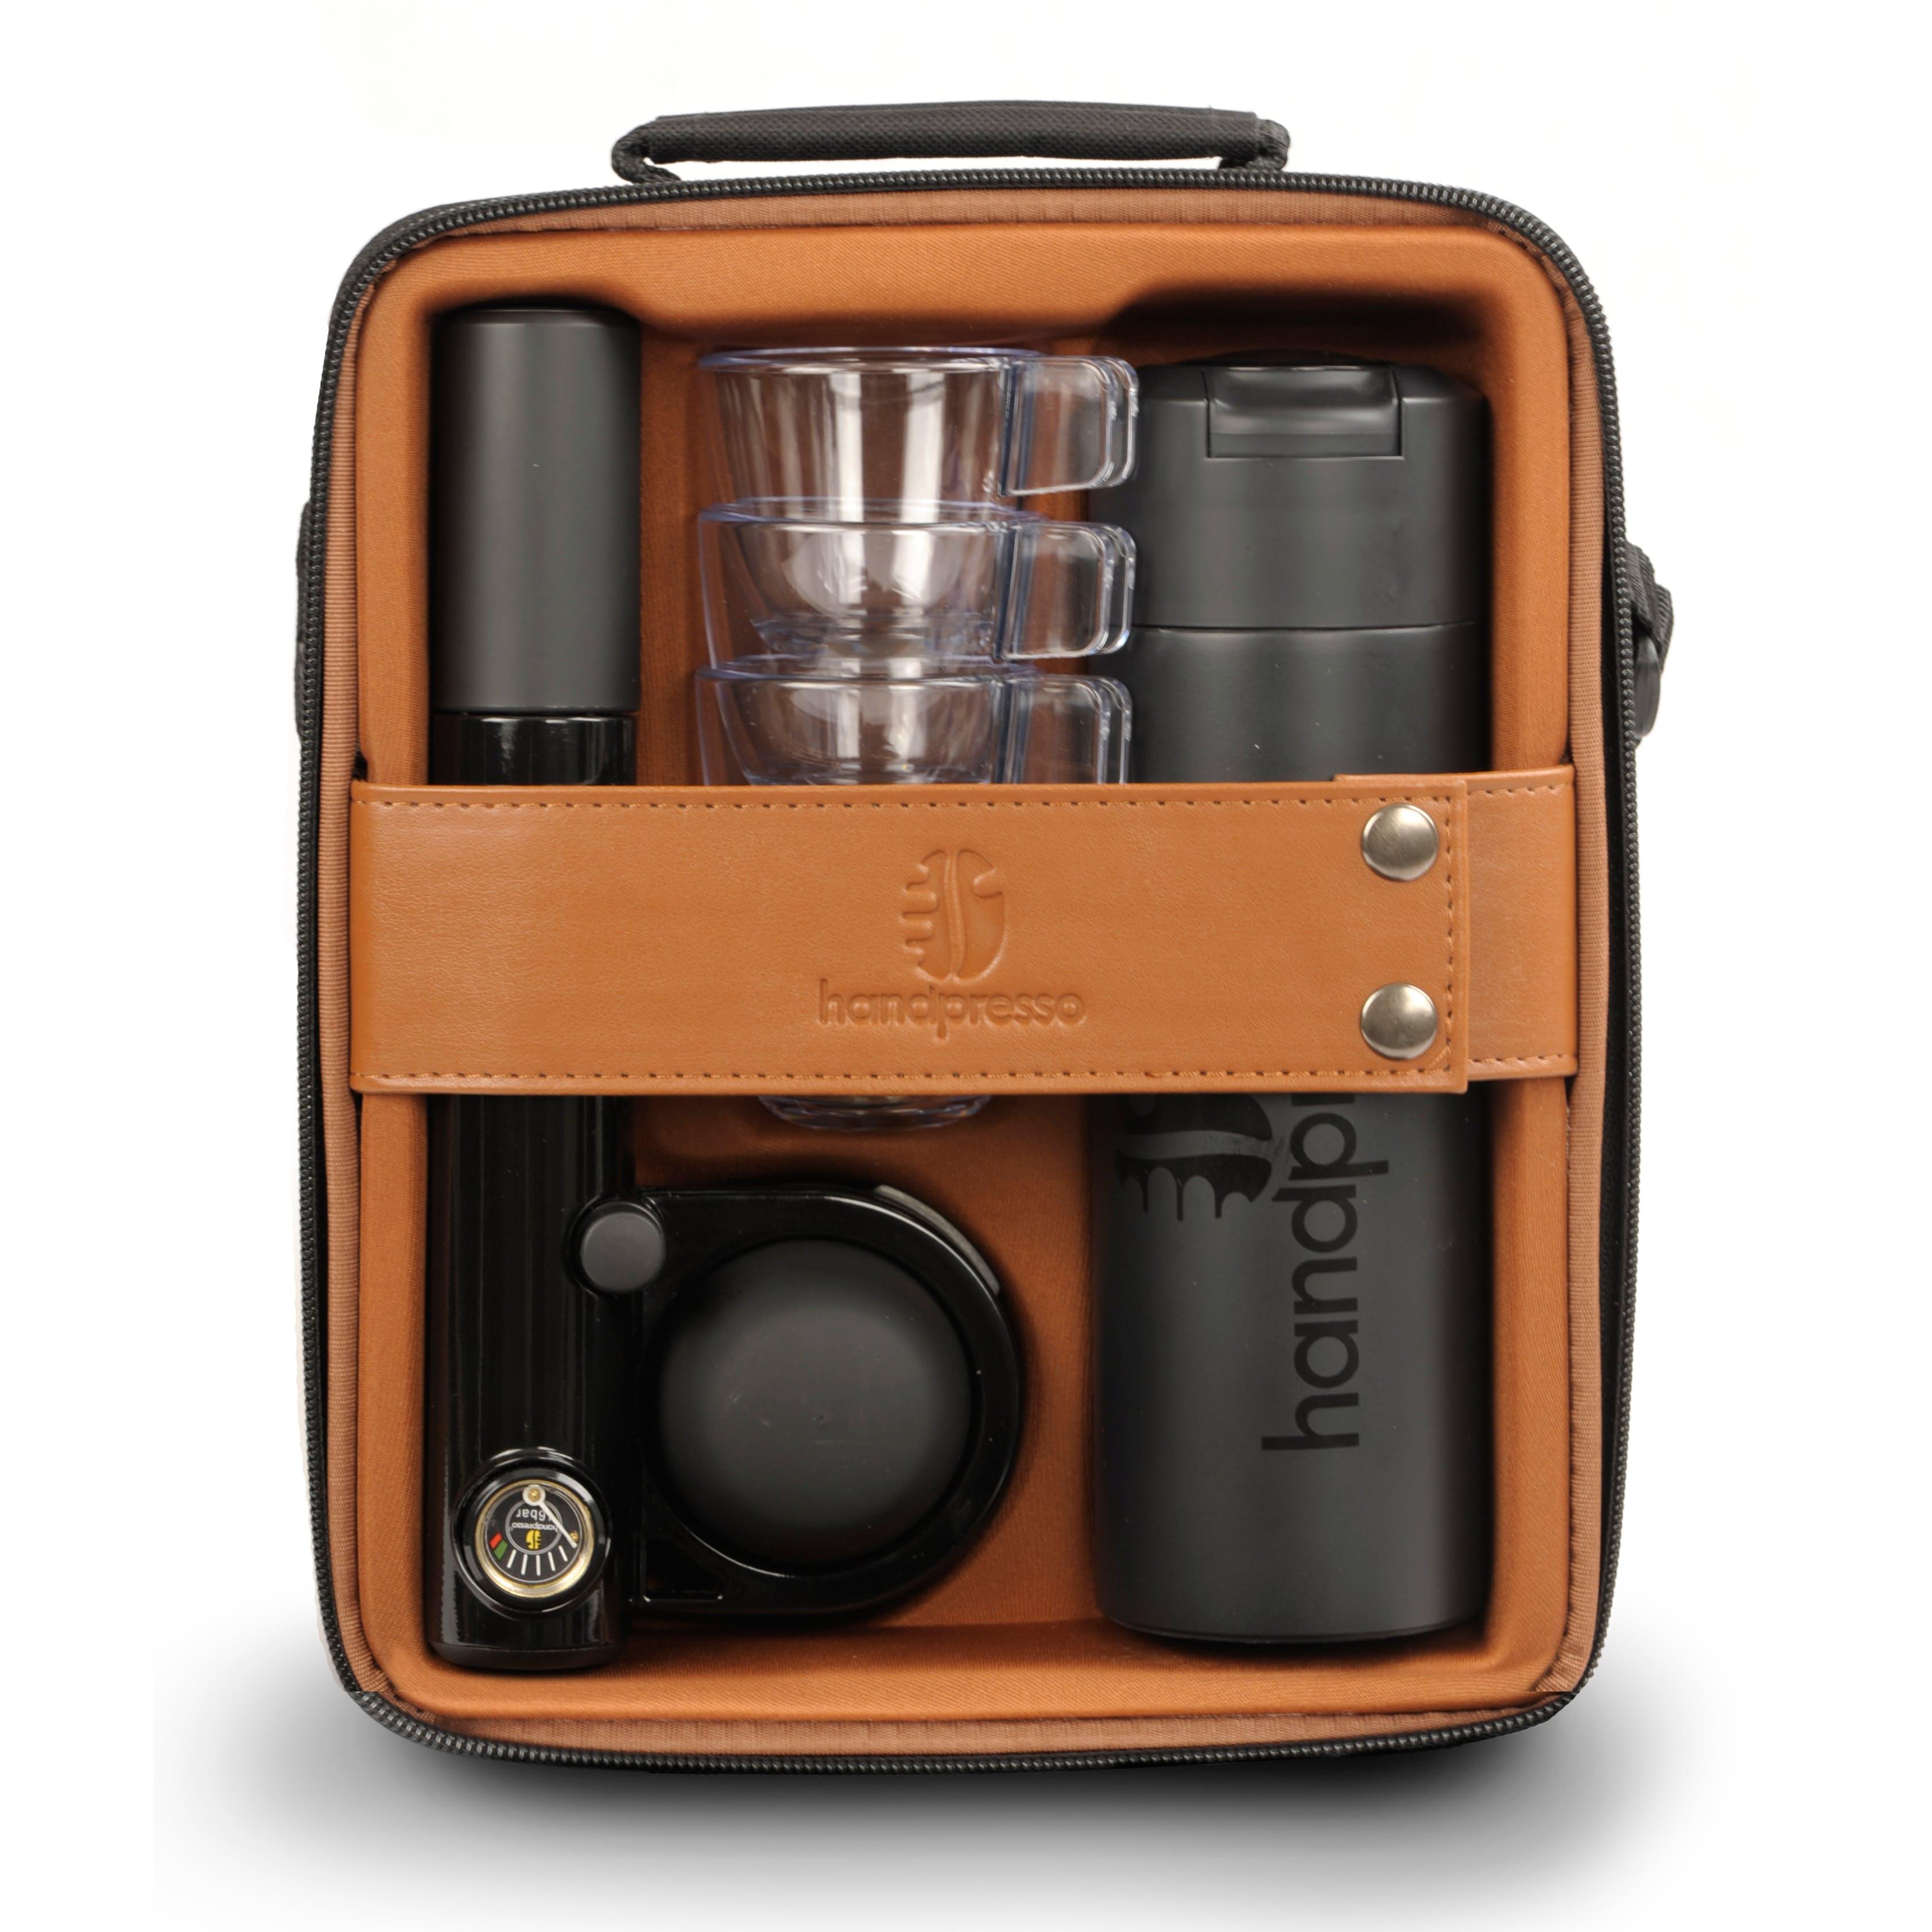 Aviwnpb9ew handpresso outdoor espresso set 0 original